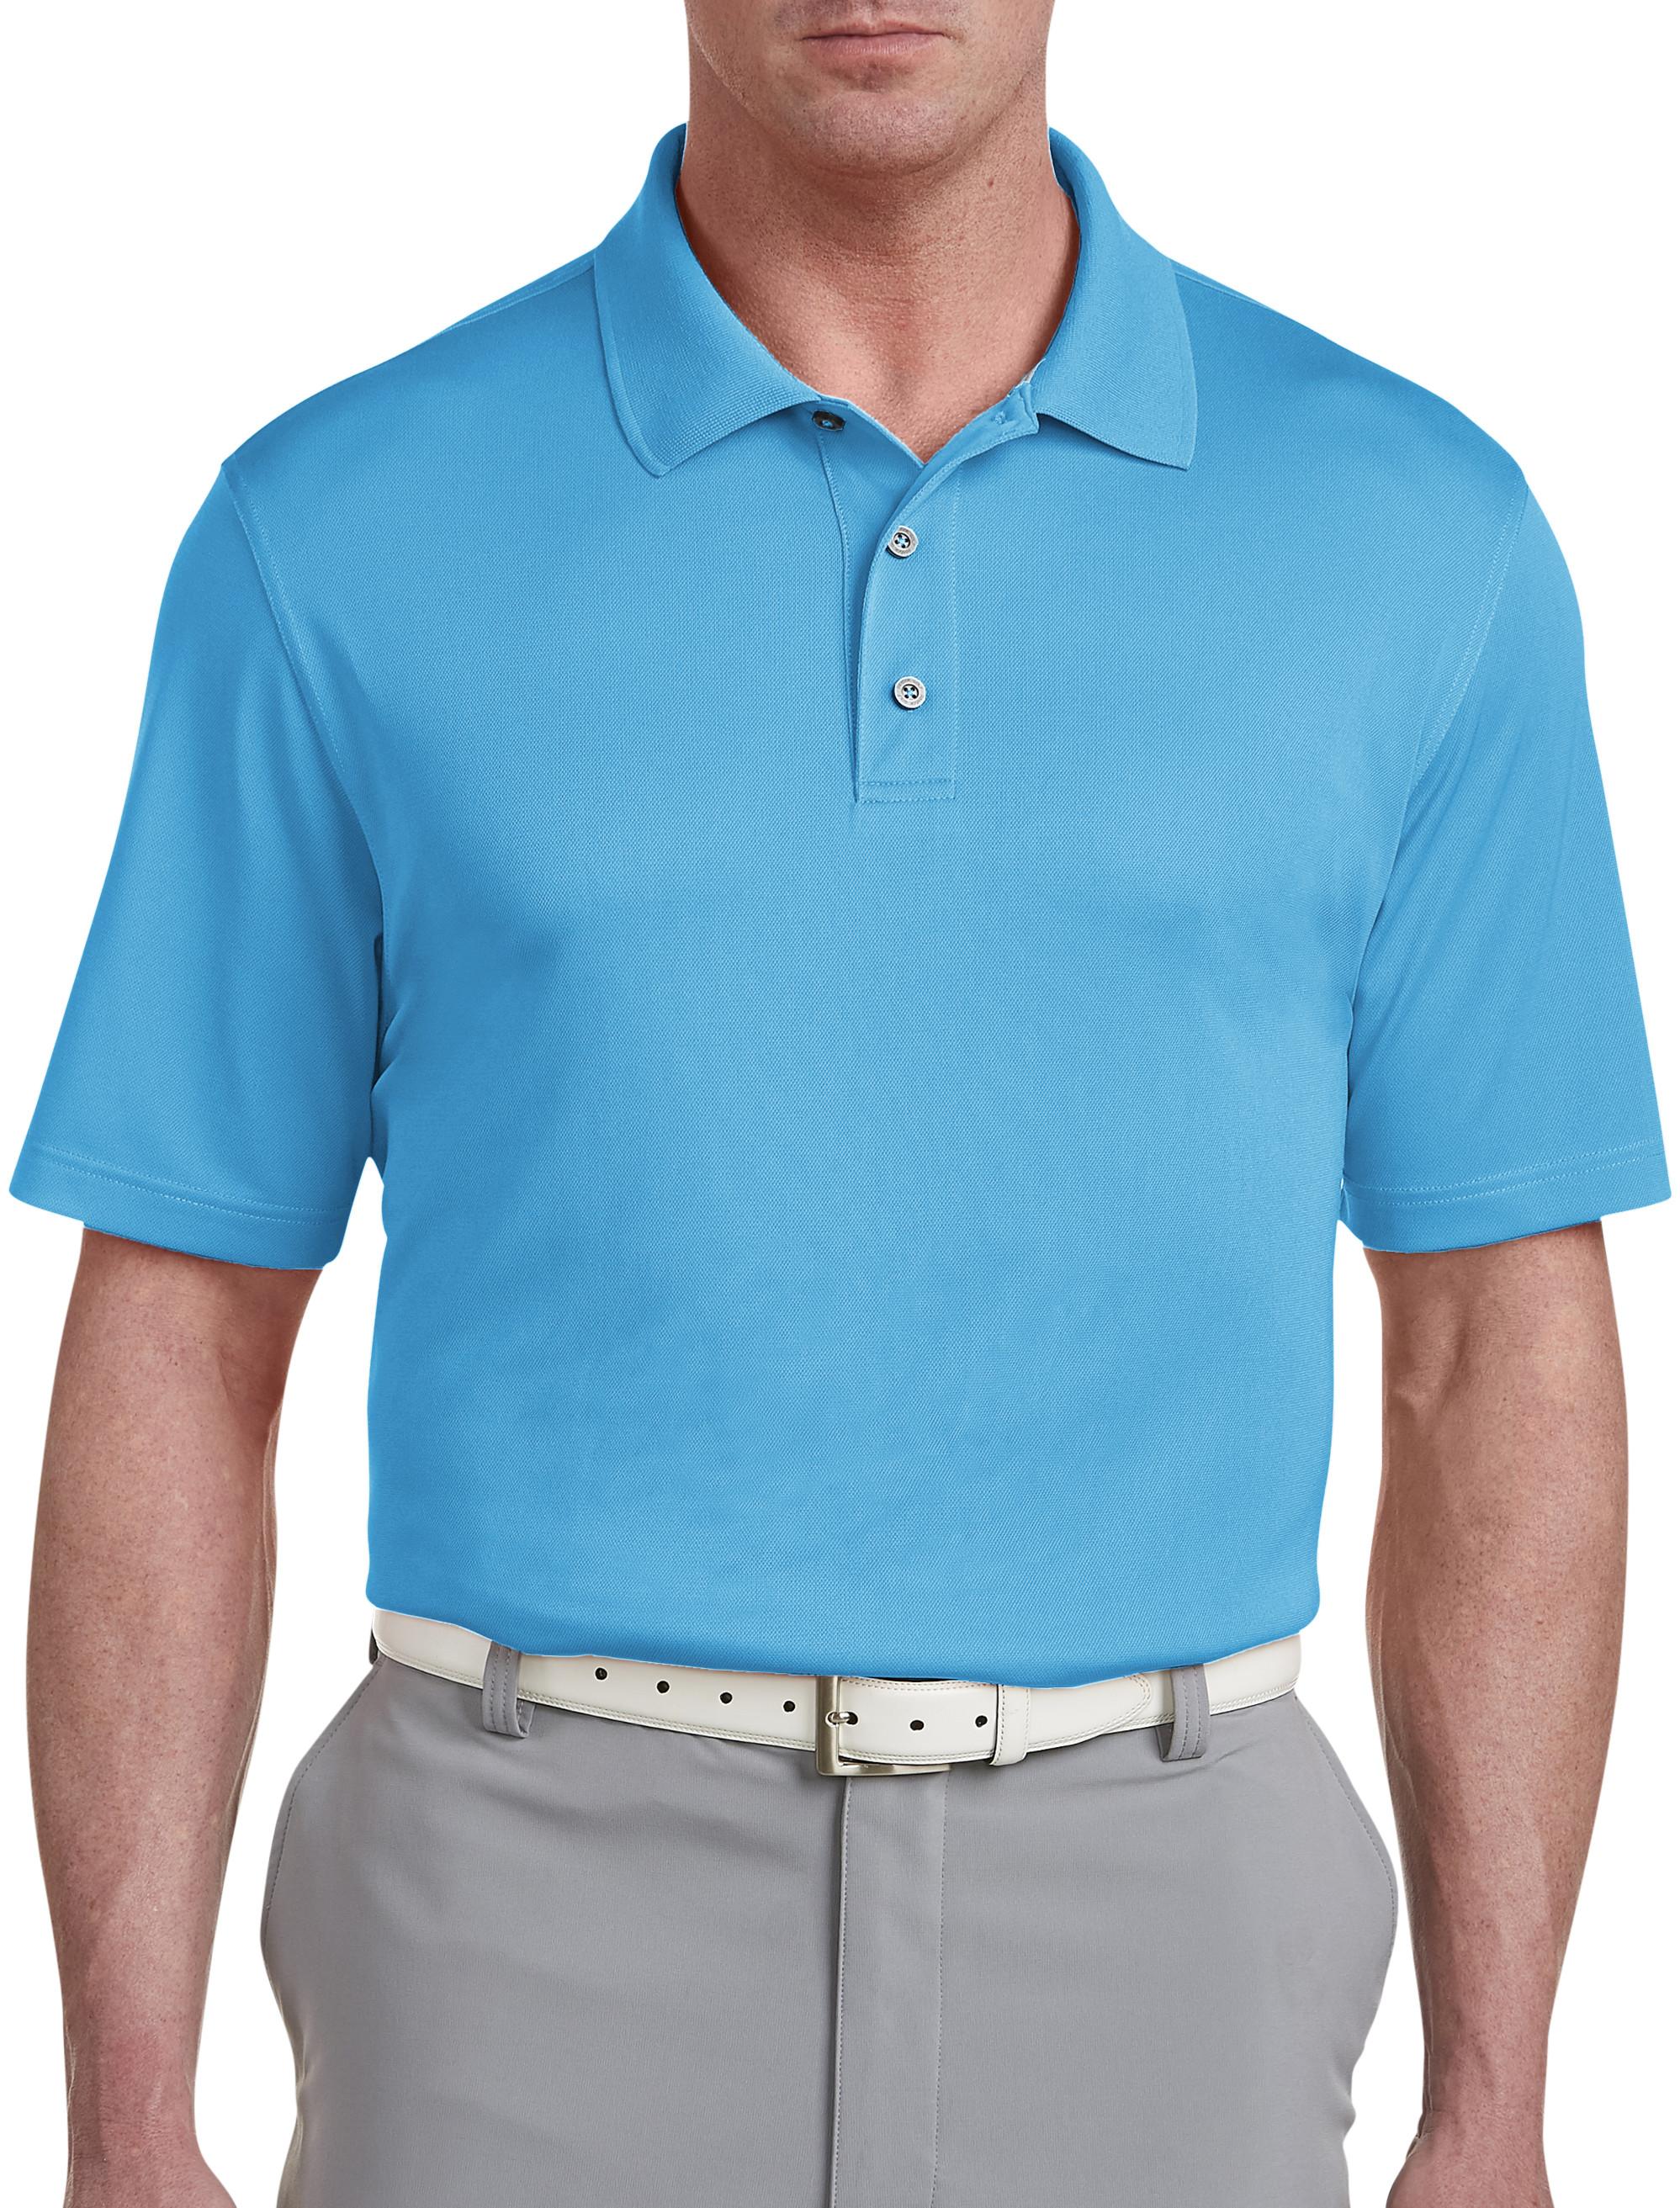 Reebok Golf Speedwick Polo Shirt